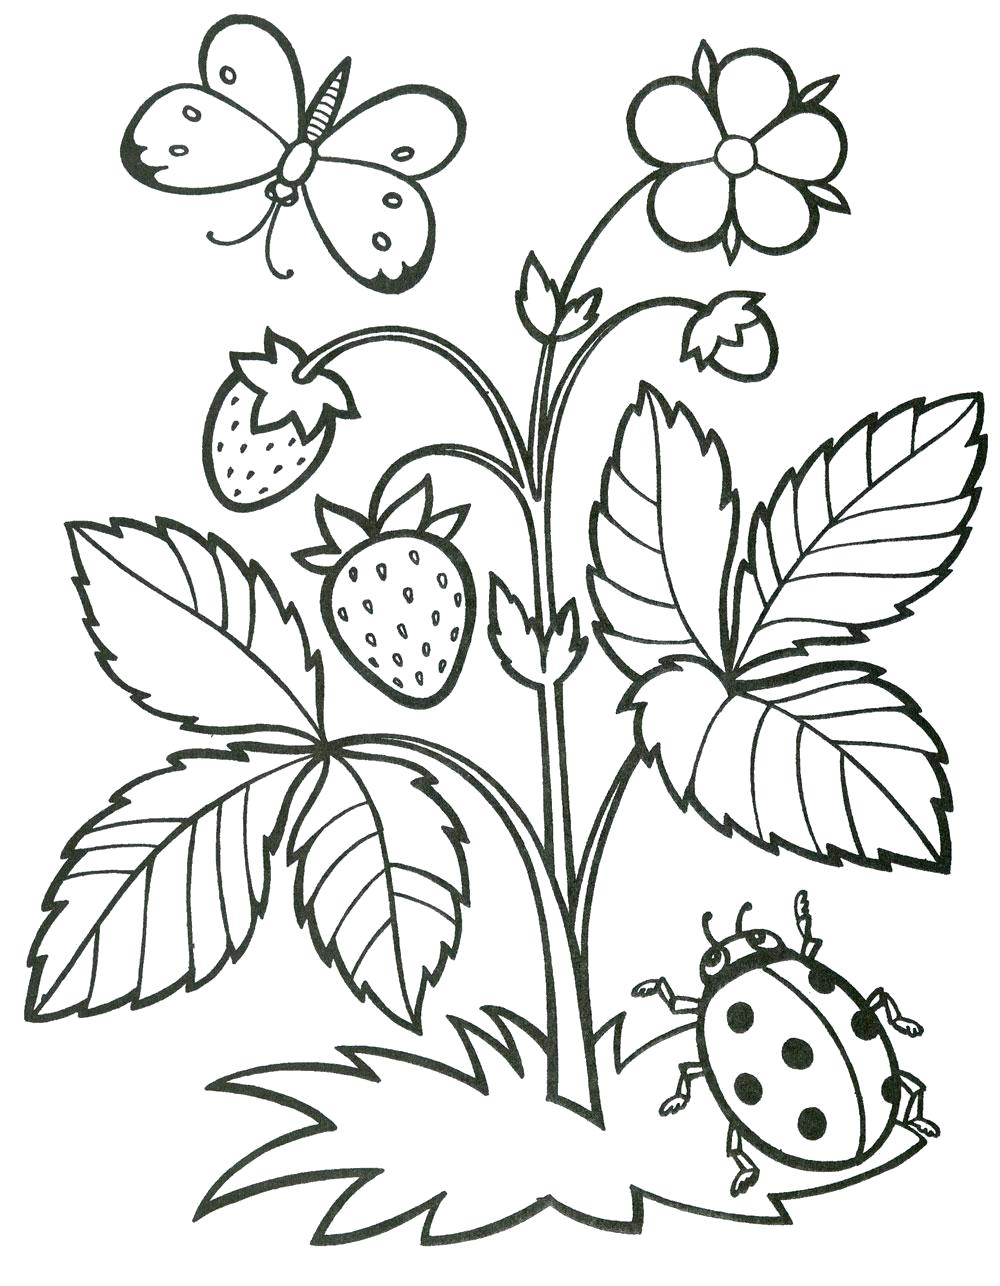 Название: Раскраска Земляника. Категория: ягоды. Теги: земляника.